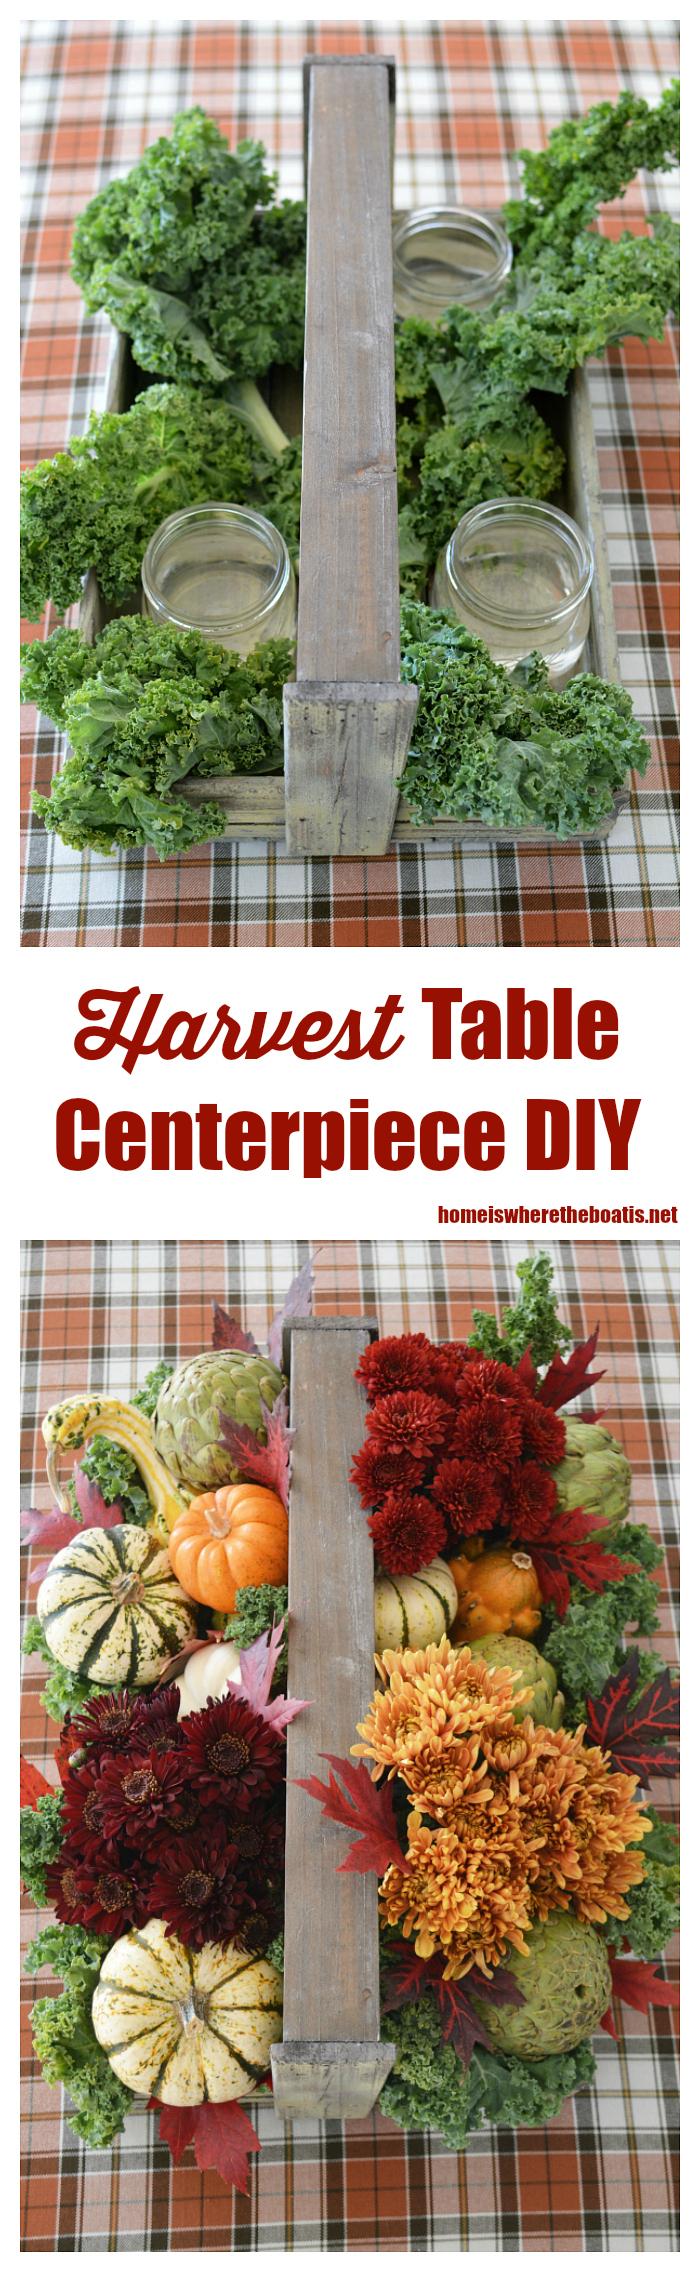 harvest-centerpiece-diy